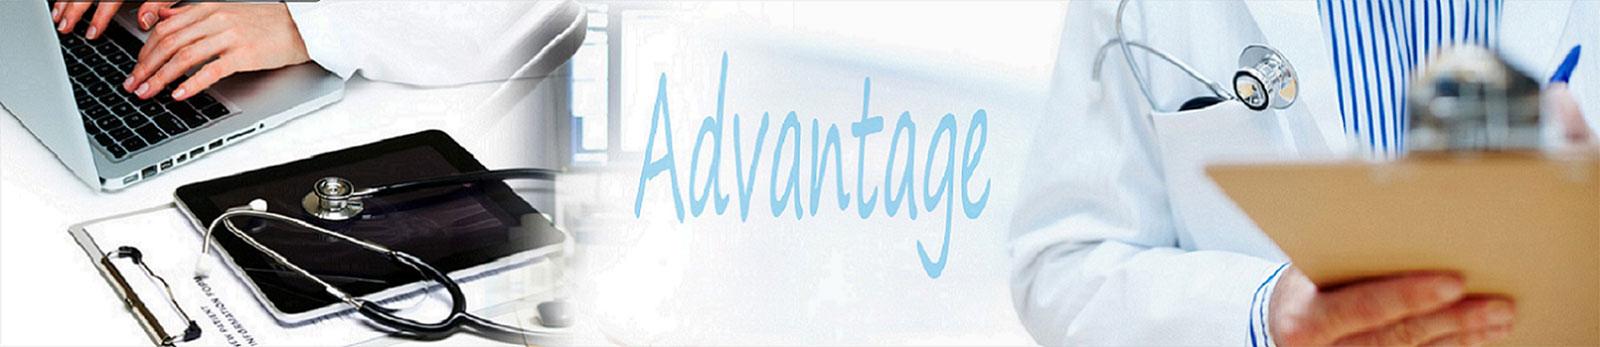 advantage-banner